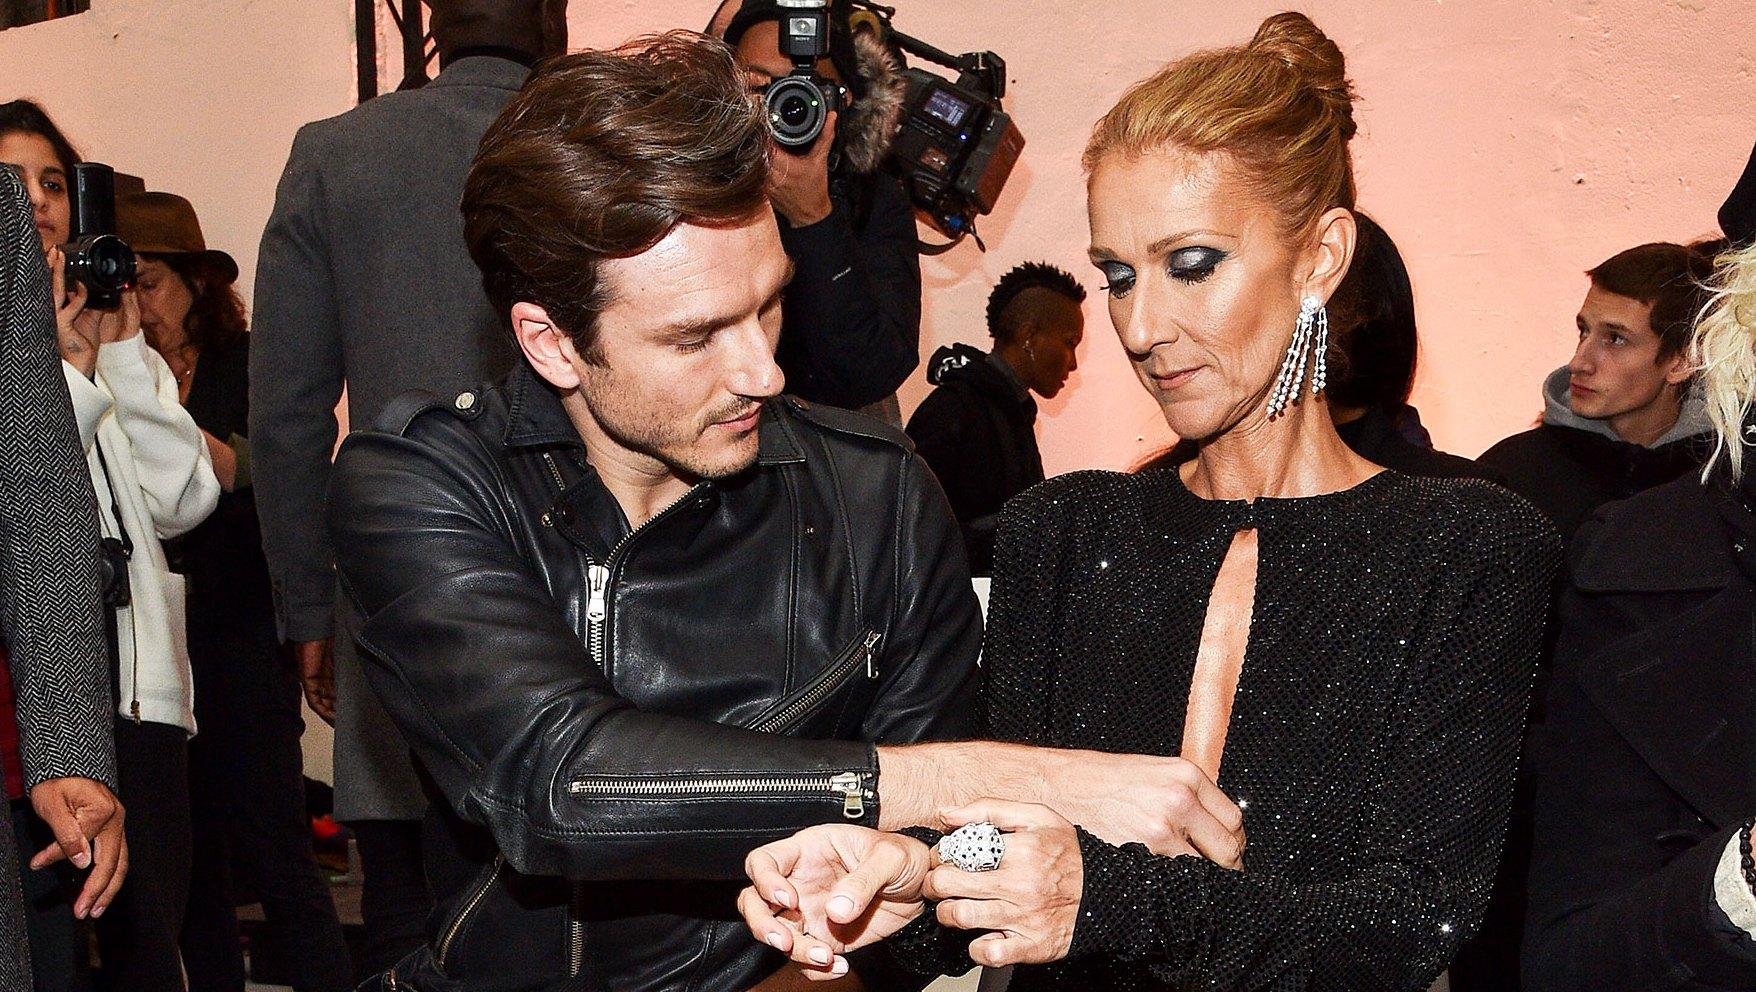 Pepe Munoz and Celine Dion Wardrobe Malfunctions